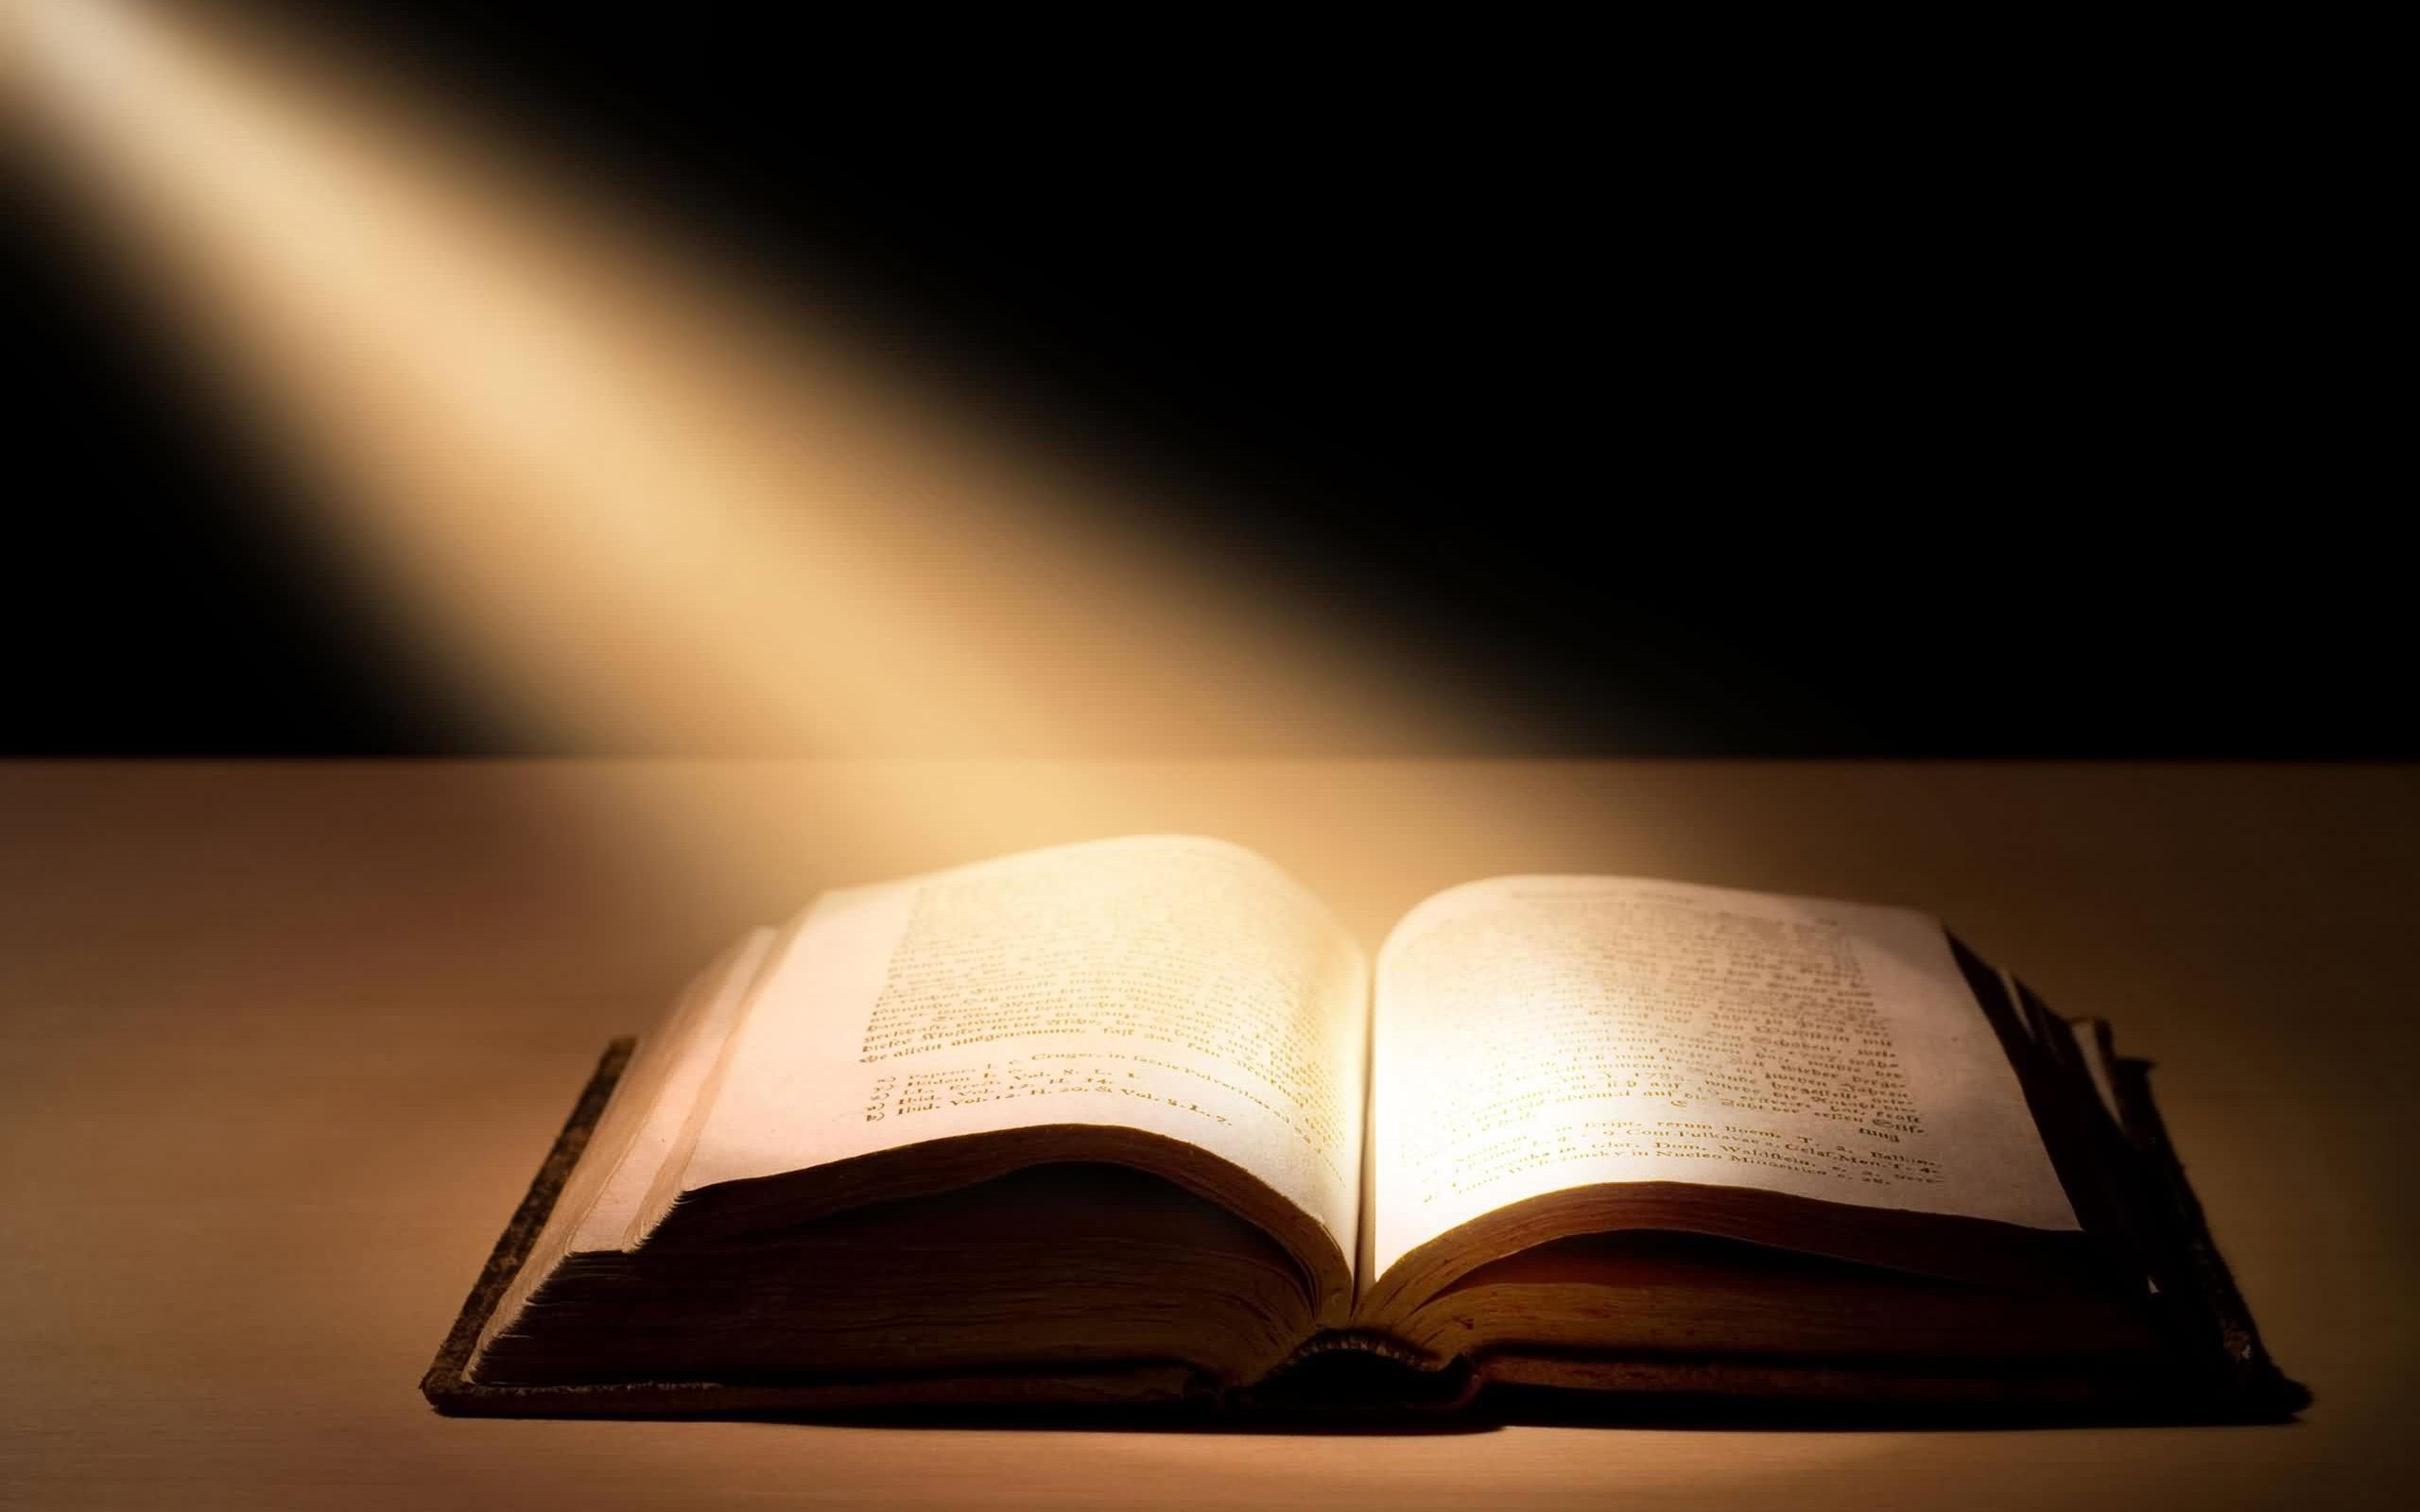 Bible Backgrounds wallpaper   1104658 2560x1600